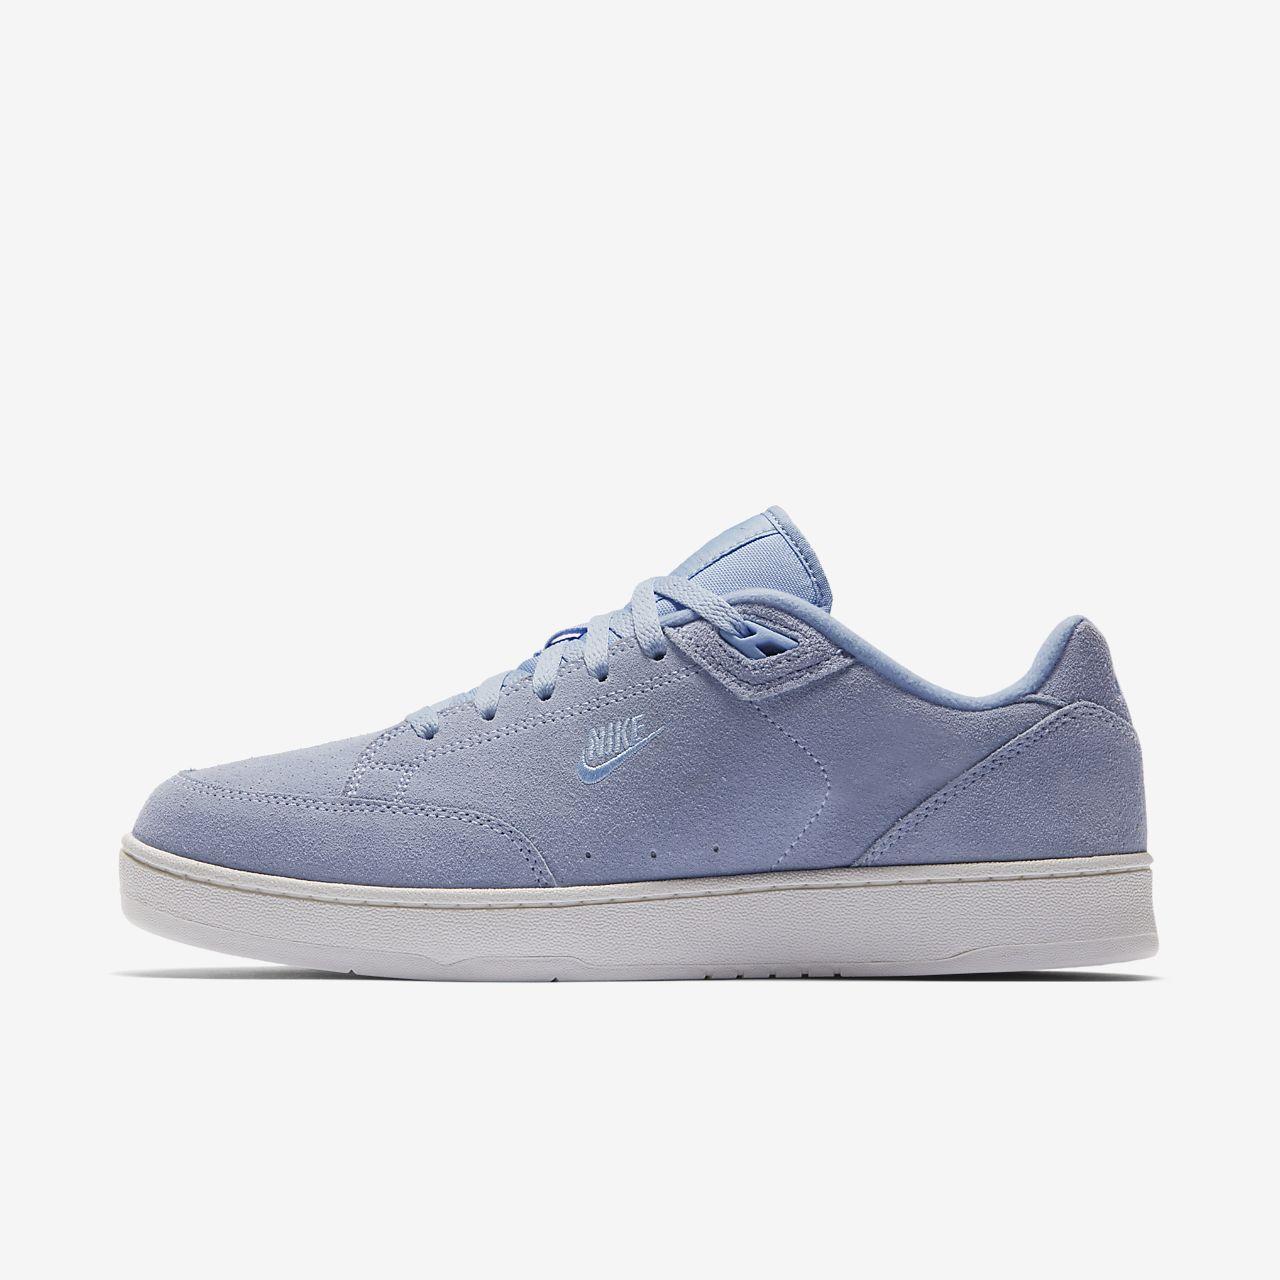 promo code 63838 7d605 ... Nike Grandstand II Suede Mens Shoe